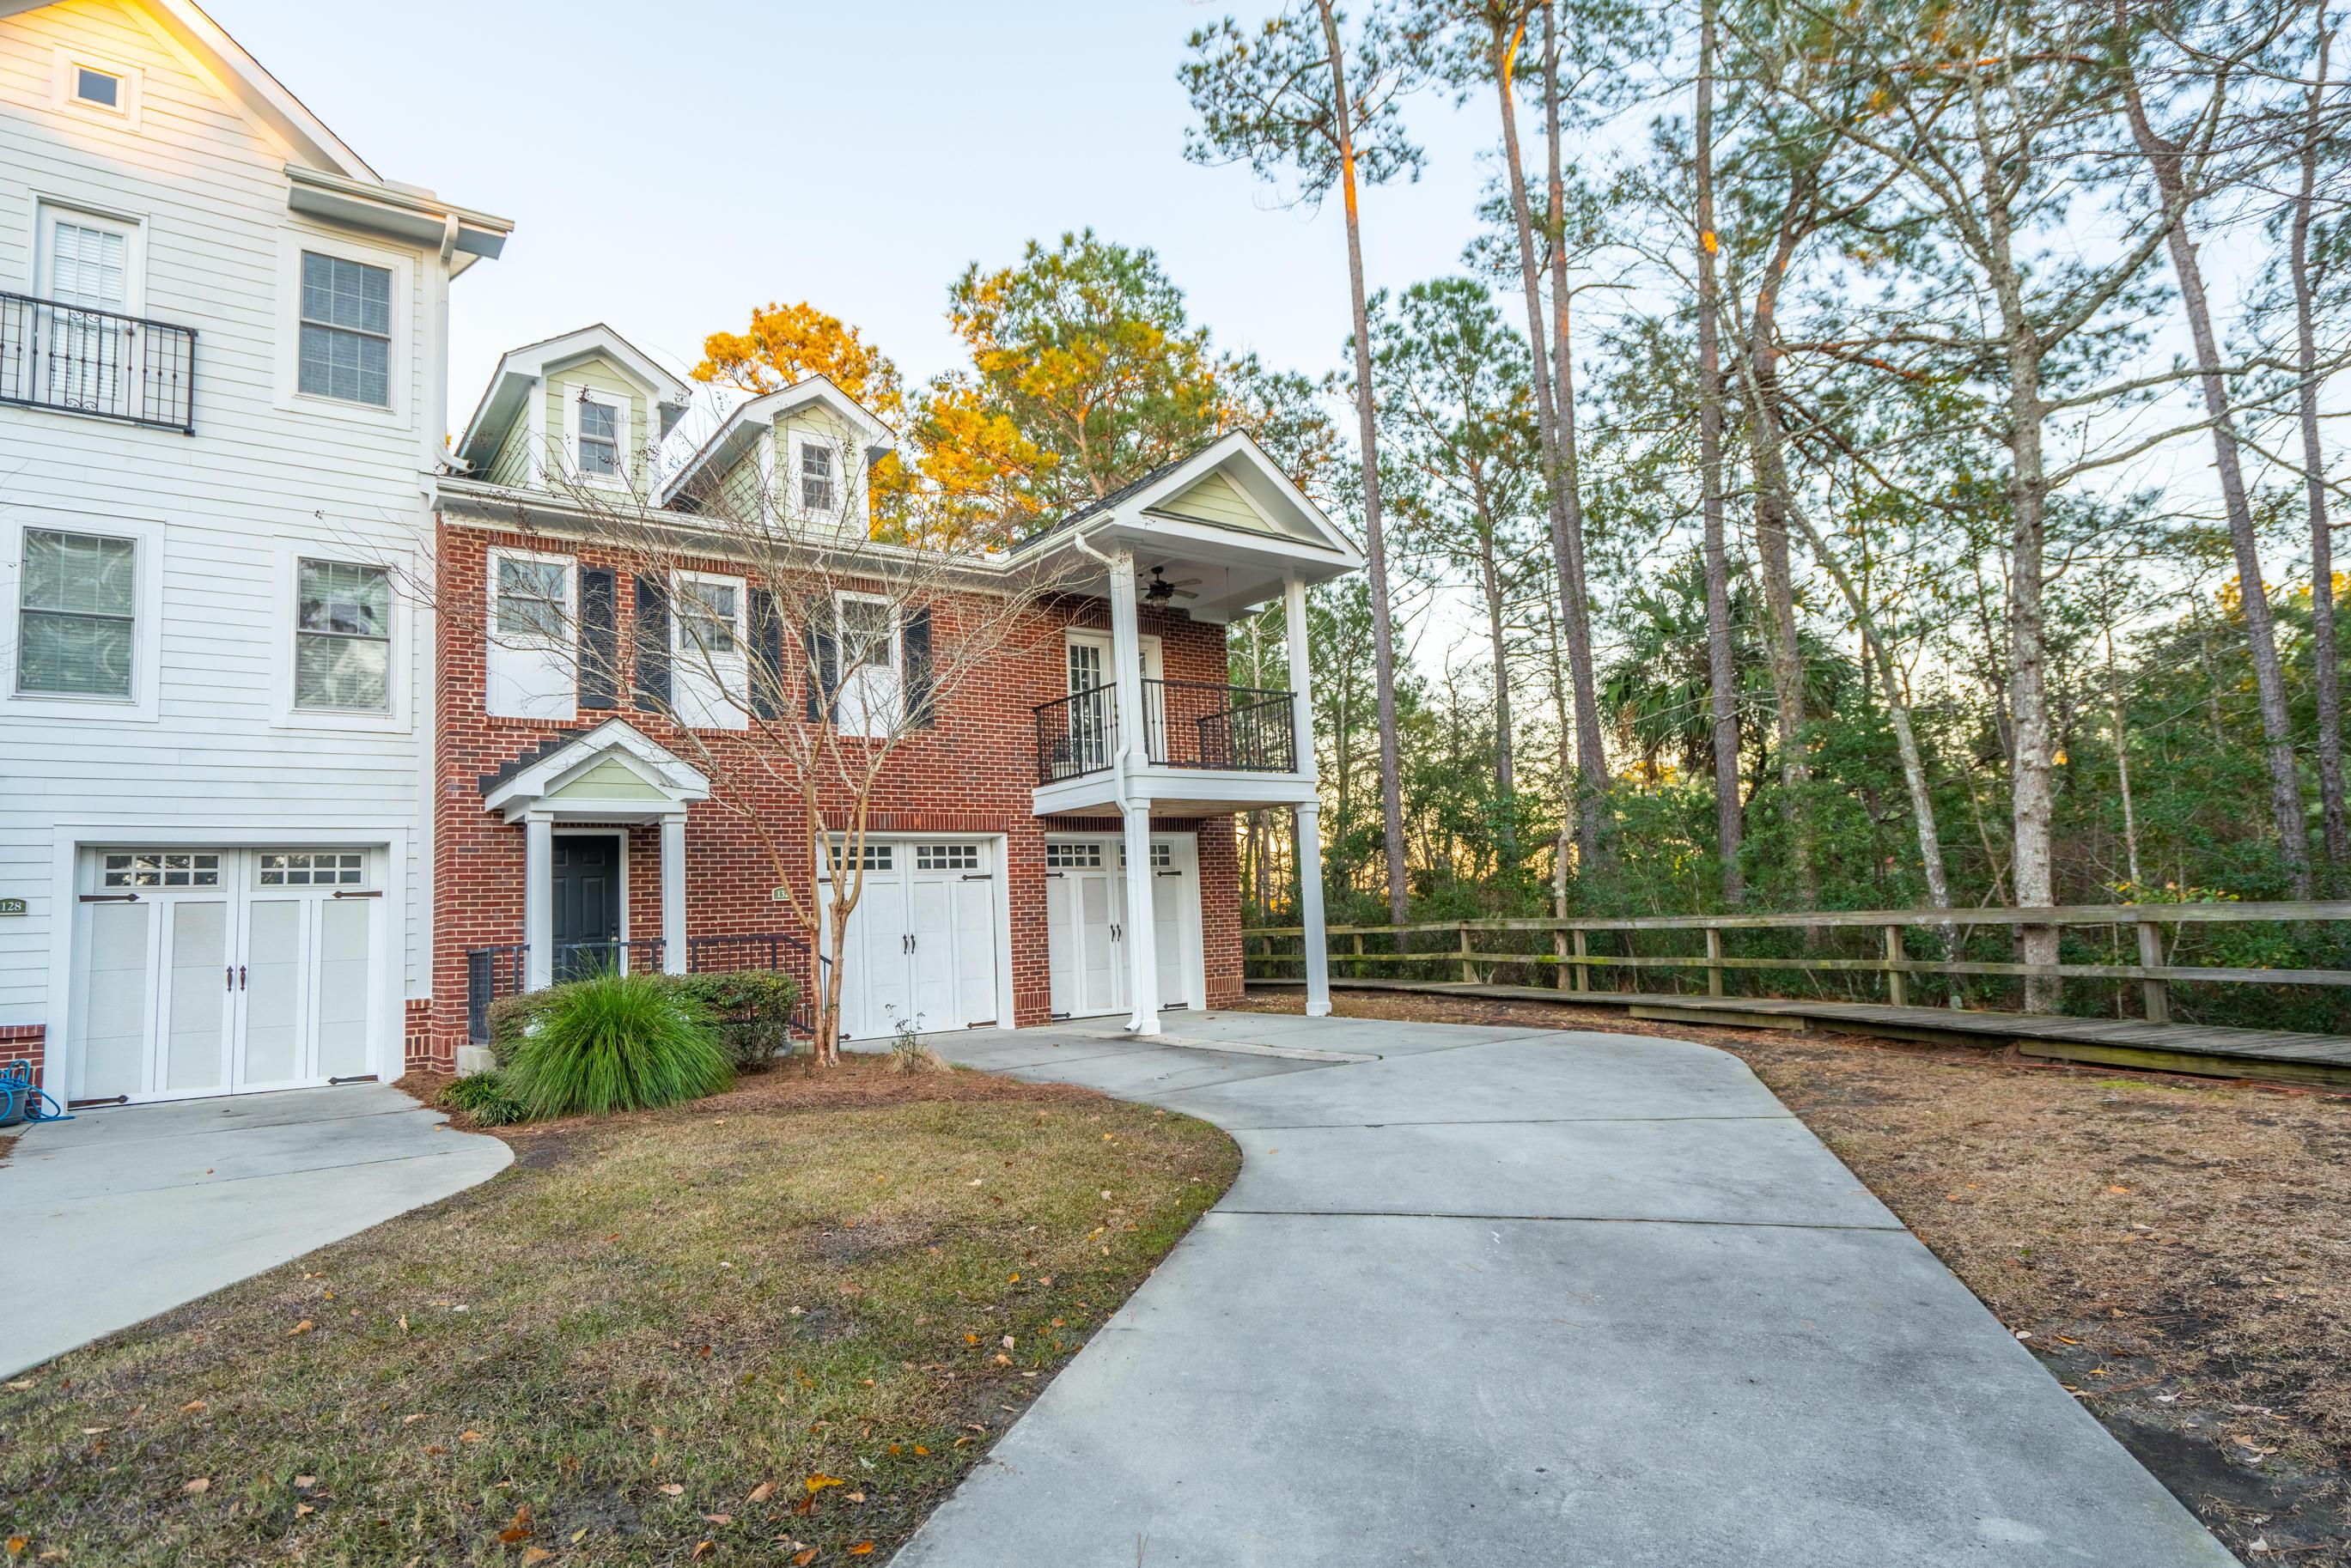 Etiwan Pointe Homes For Sale - 132 Winding Creek, Mount Pleasant, SC - 32